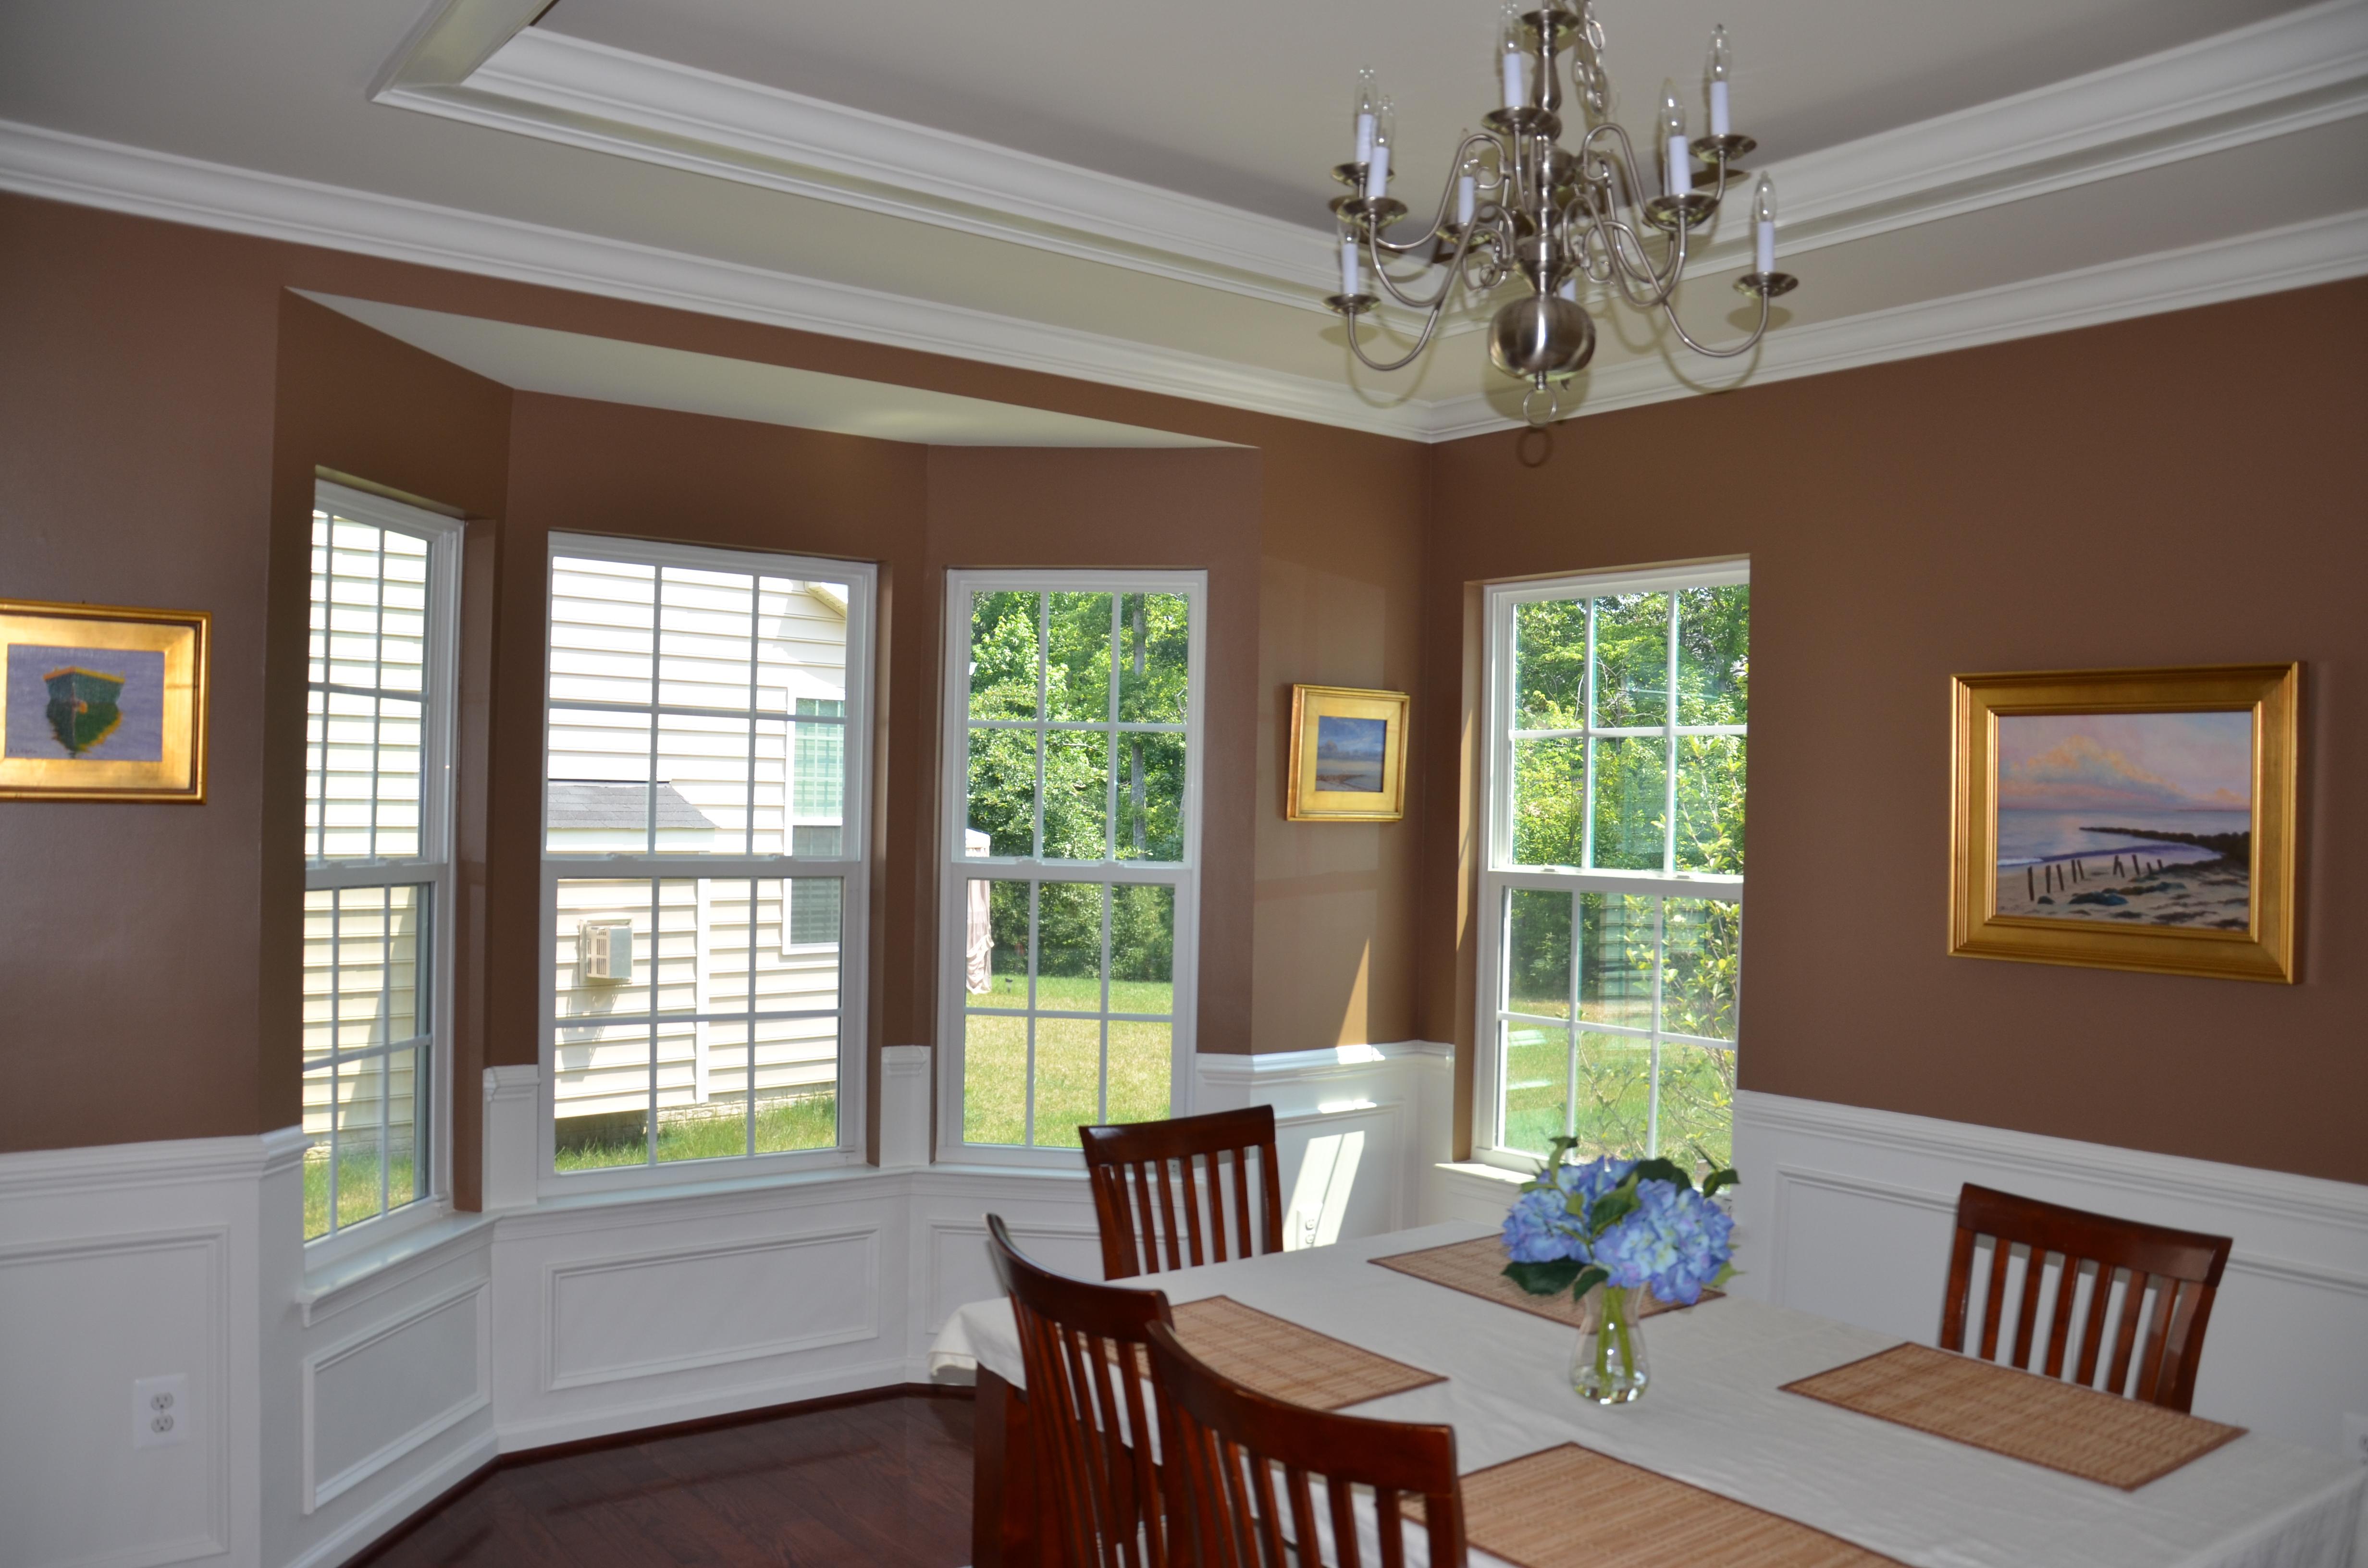 dining room artwork photo - 1